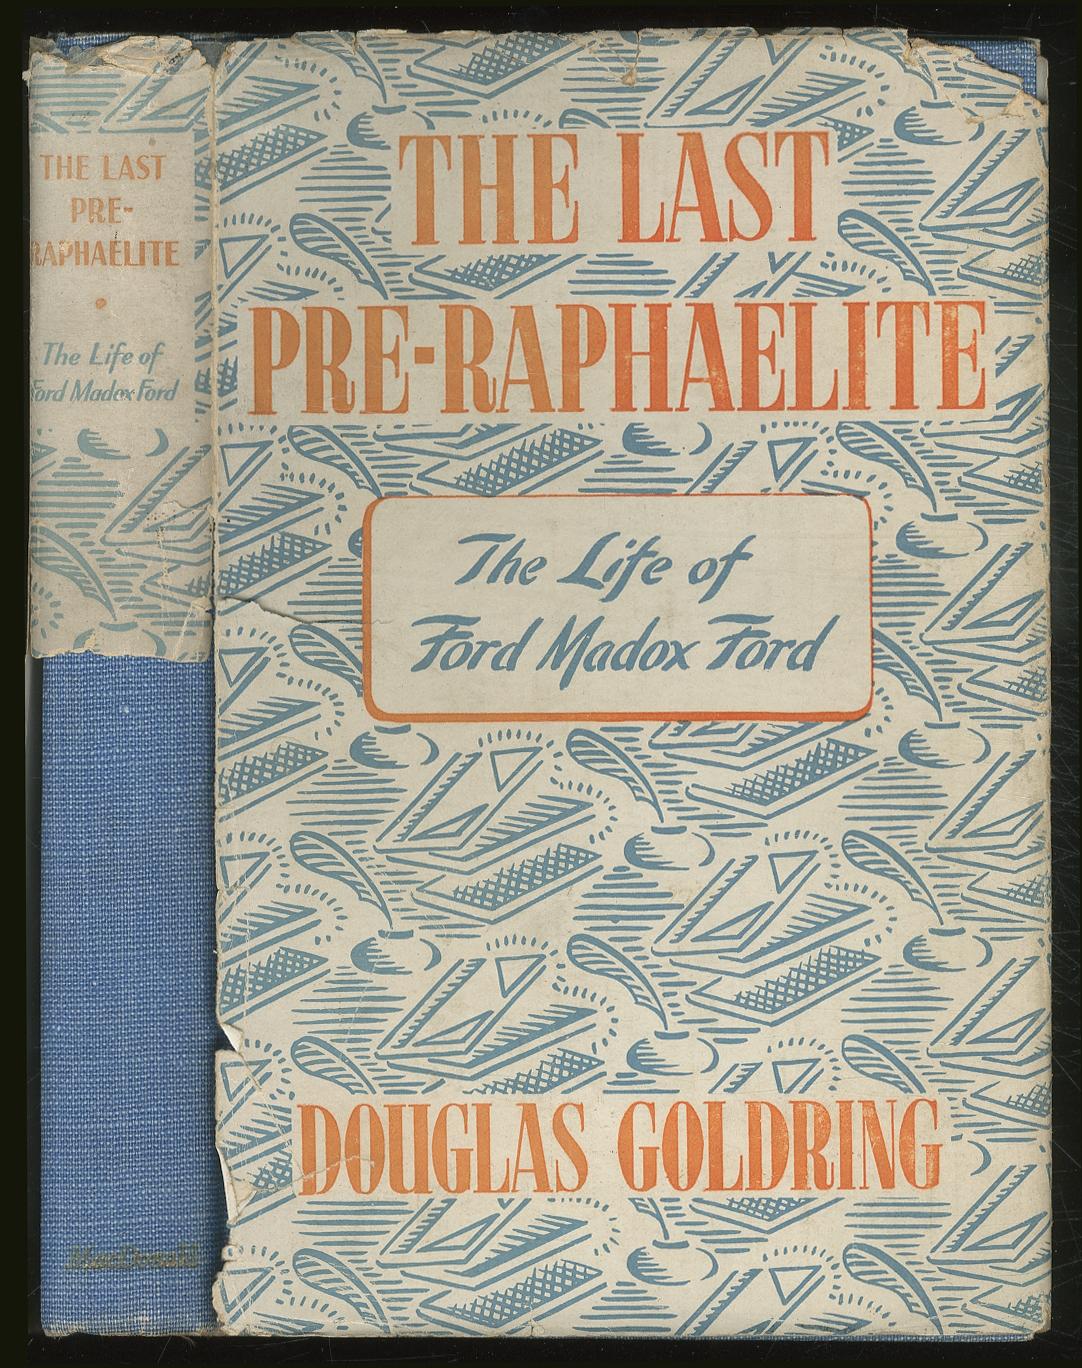 The Last Pre-Raphaelite: A Record of the: GOLDRING, Douglas